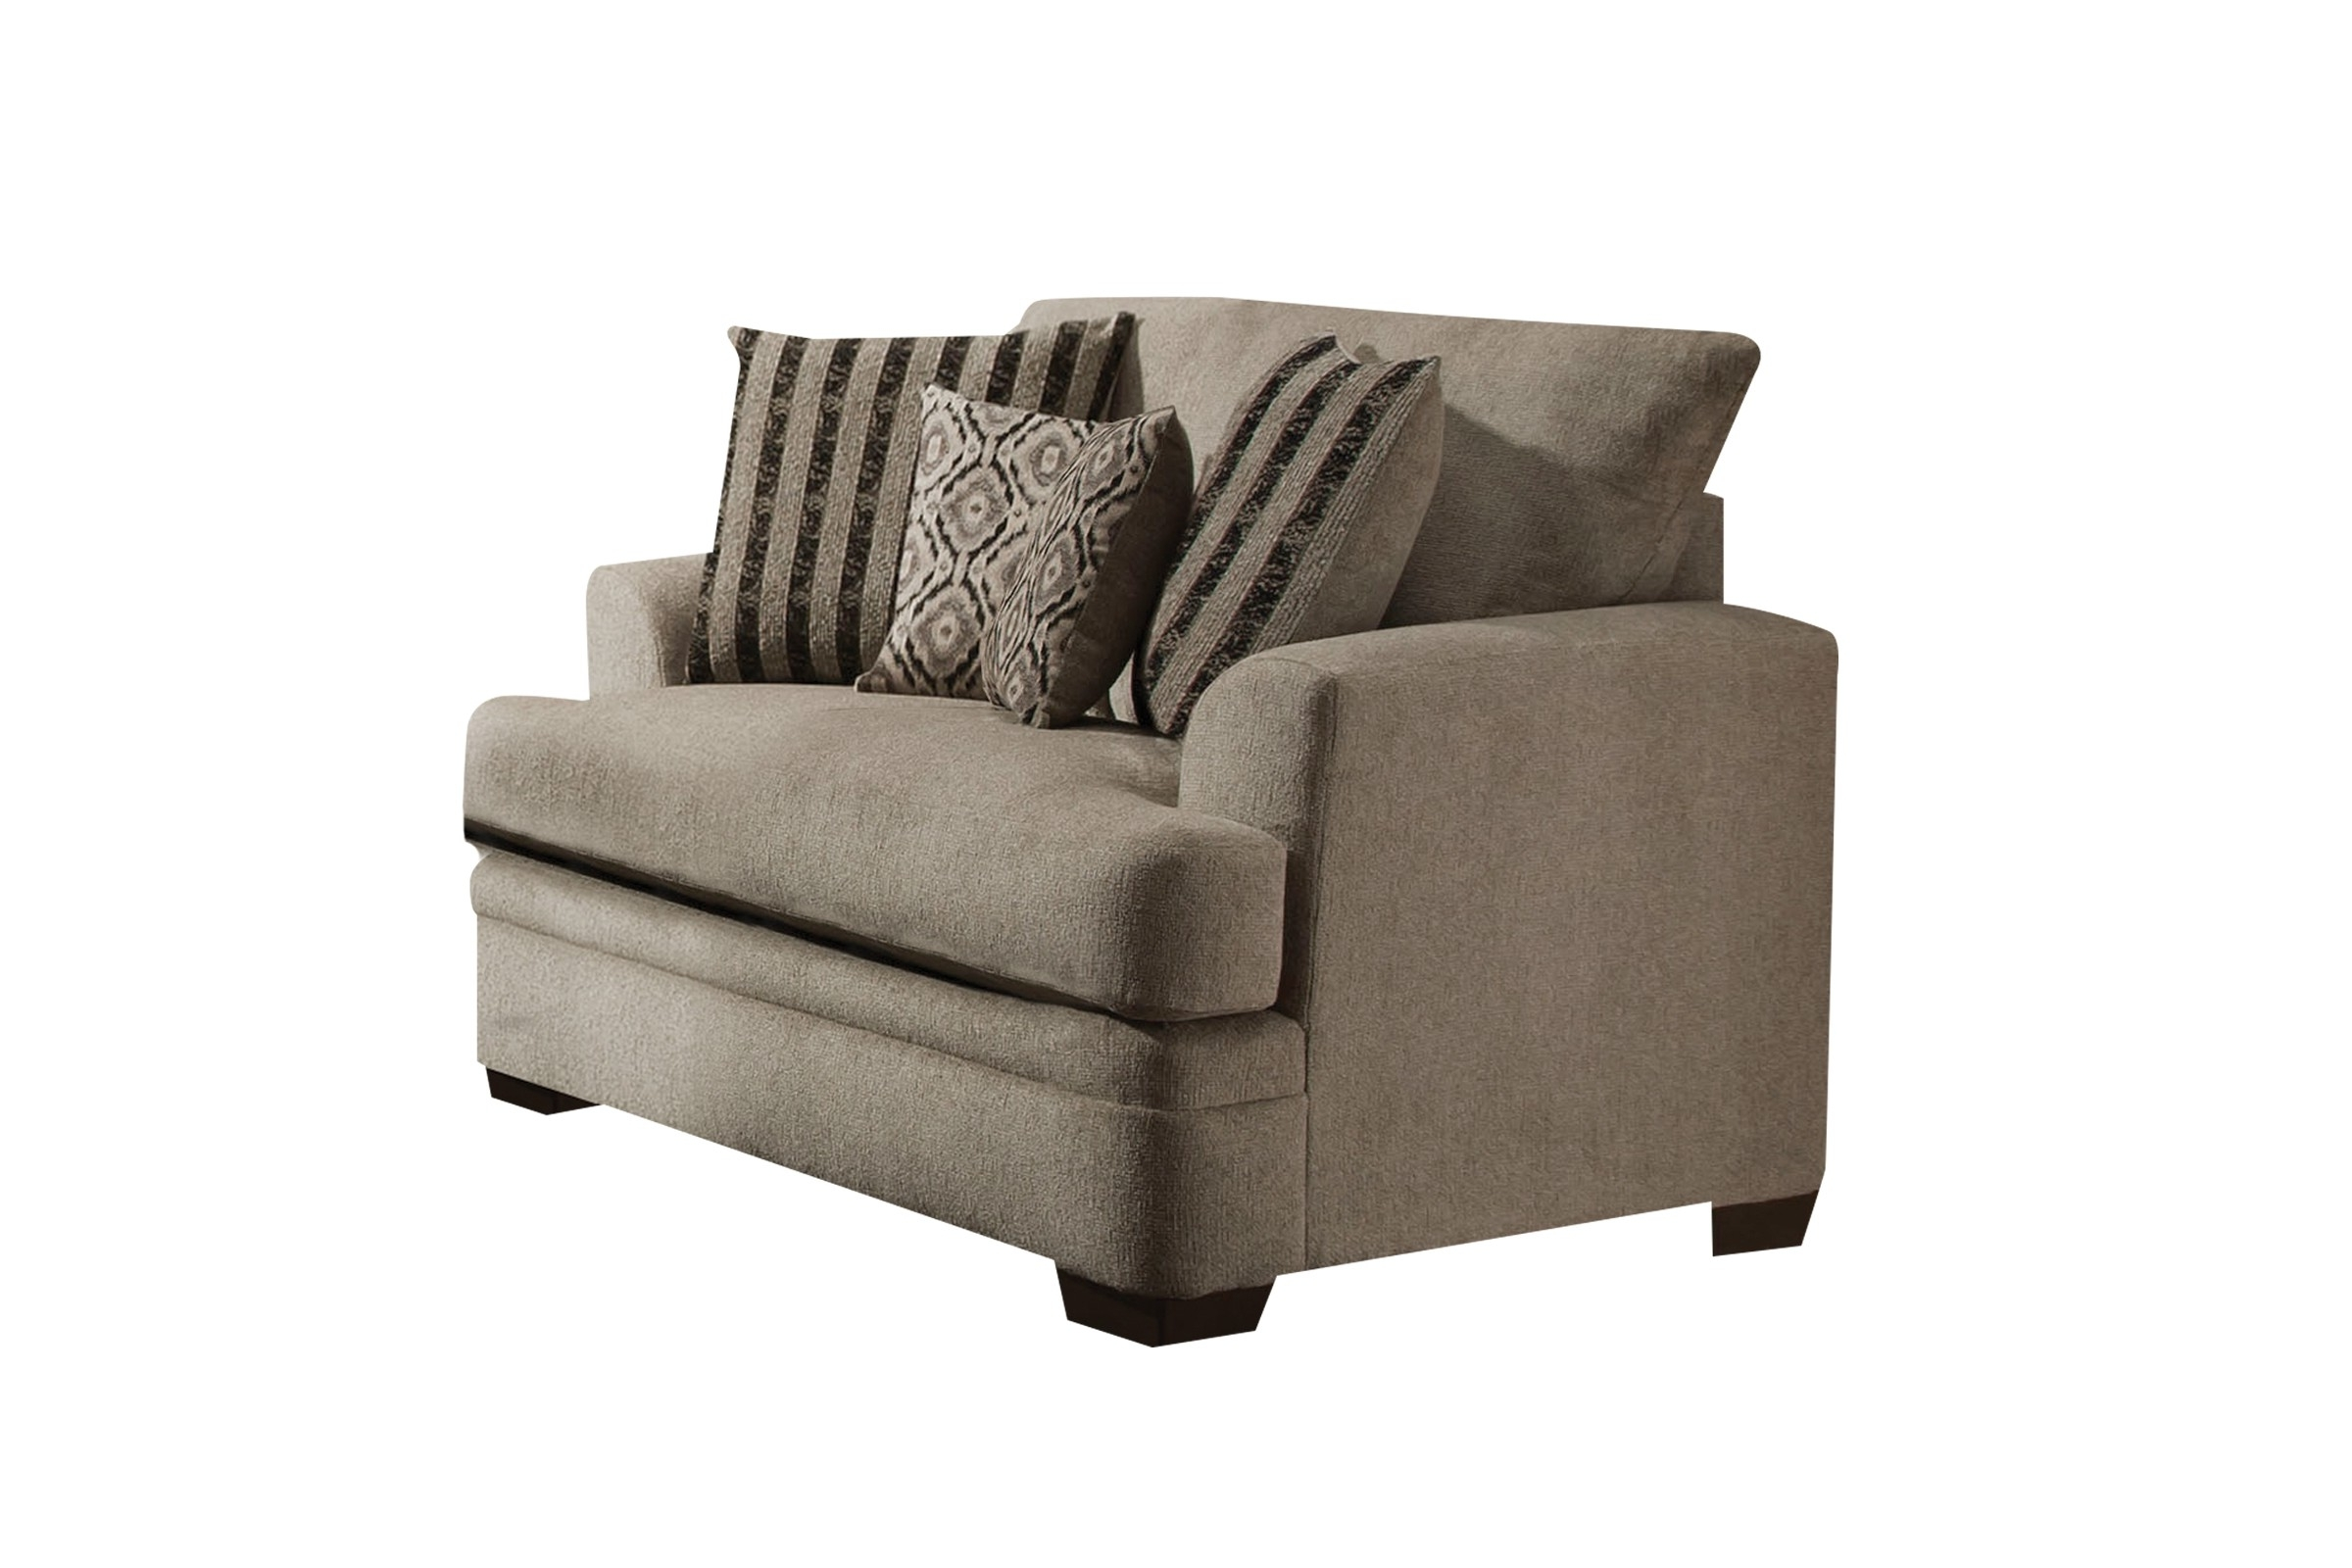 Newest Natuzzi Zeta Chaise Lounge Chairs With Furniture : Natuzzi Zeta Chaise Lounge Chairs Chaise Lounge Sofa (View 14 of 15)